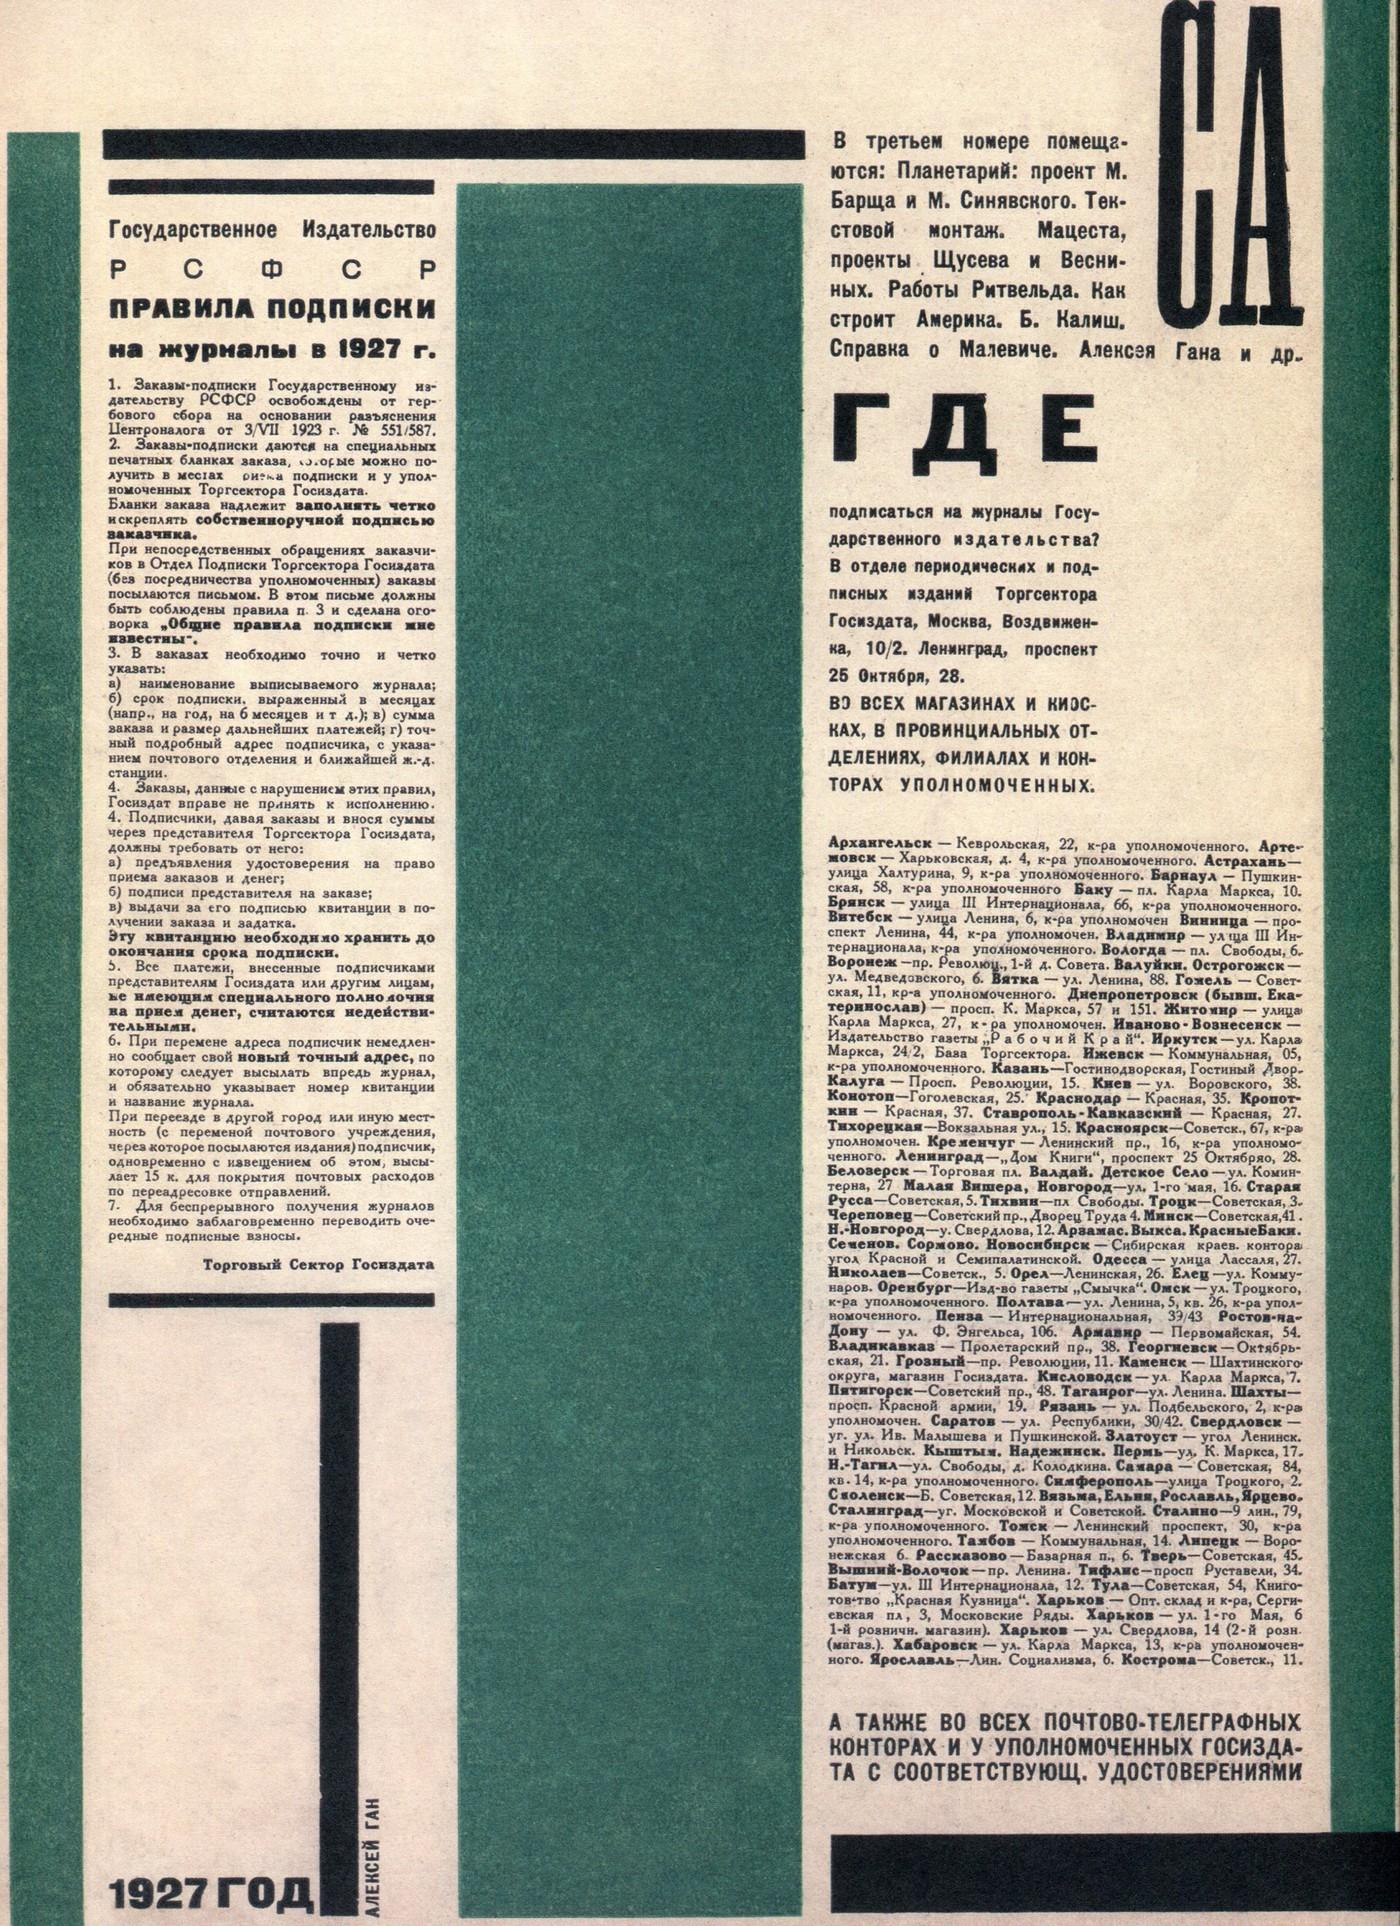 tehne.com-sa-1927-2-1400-036